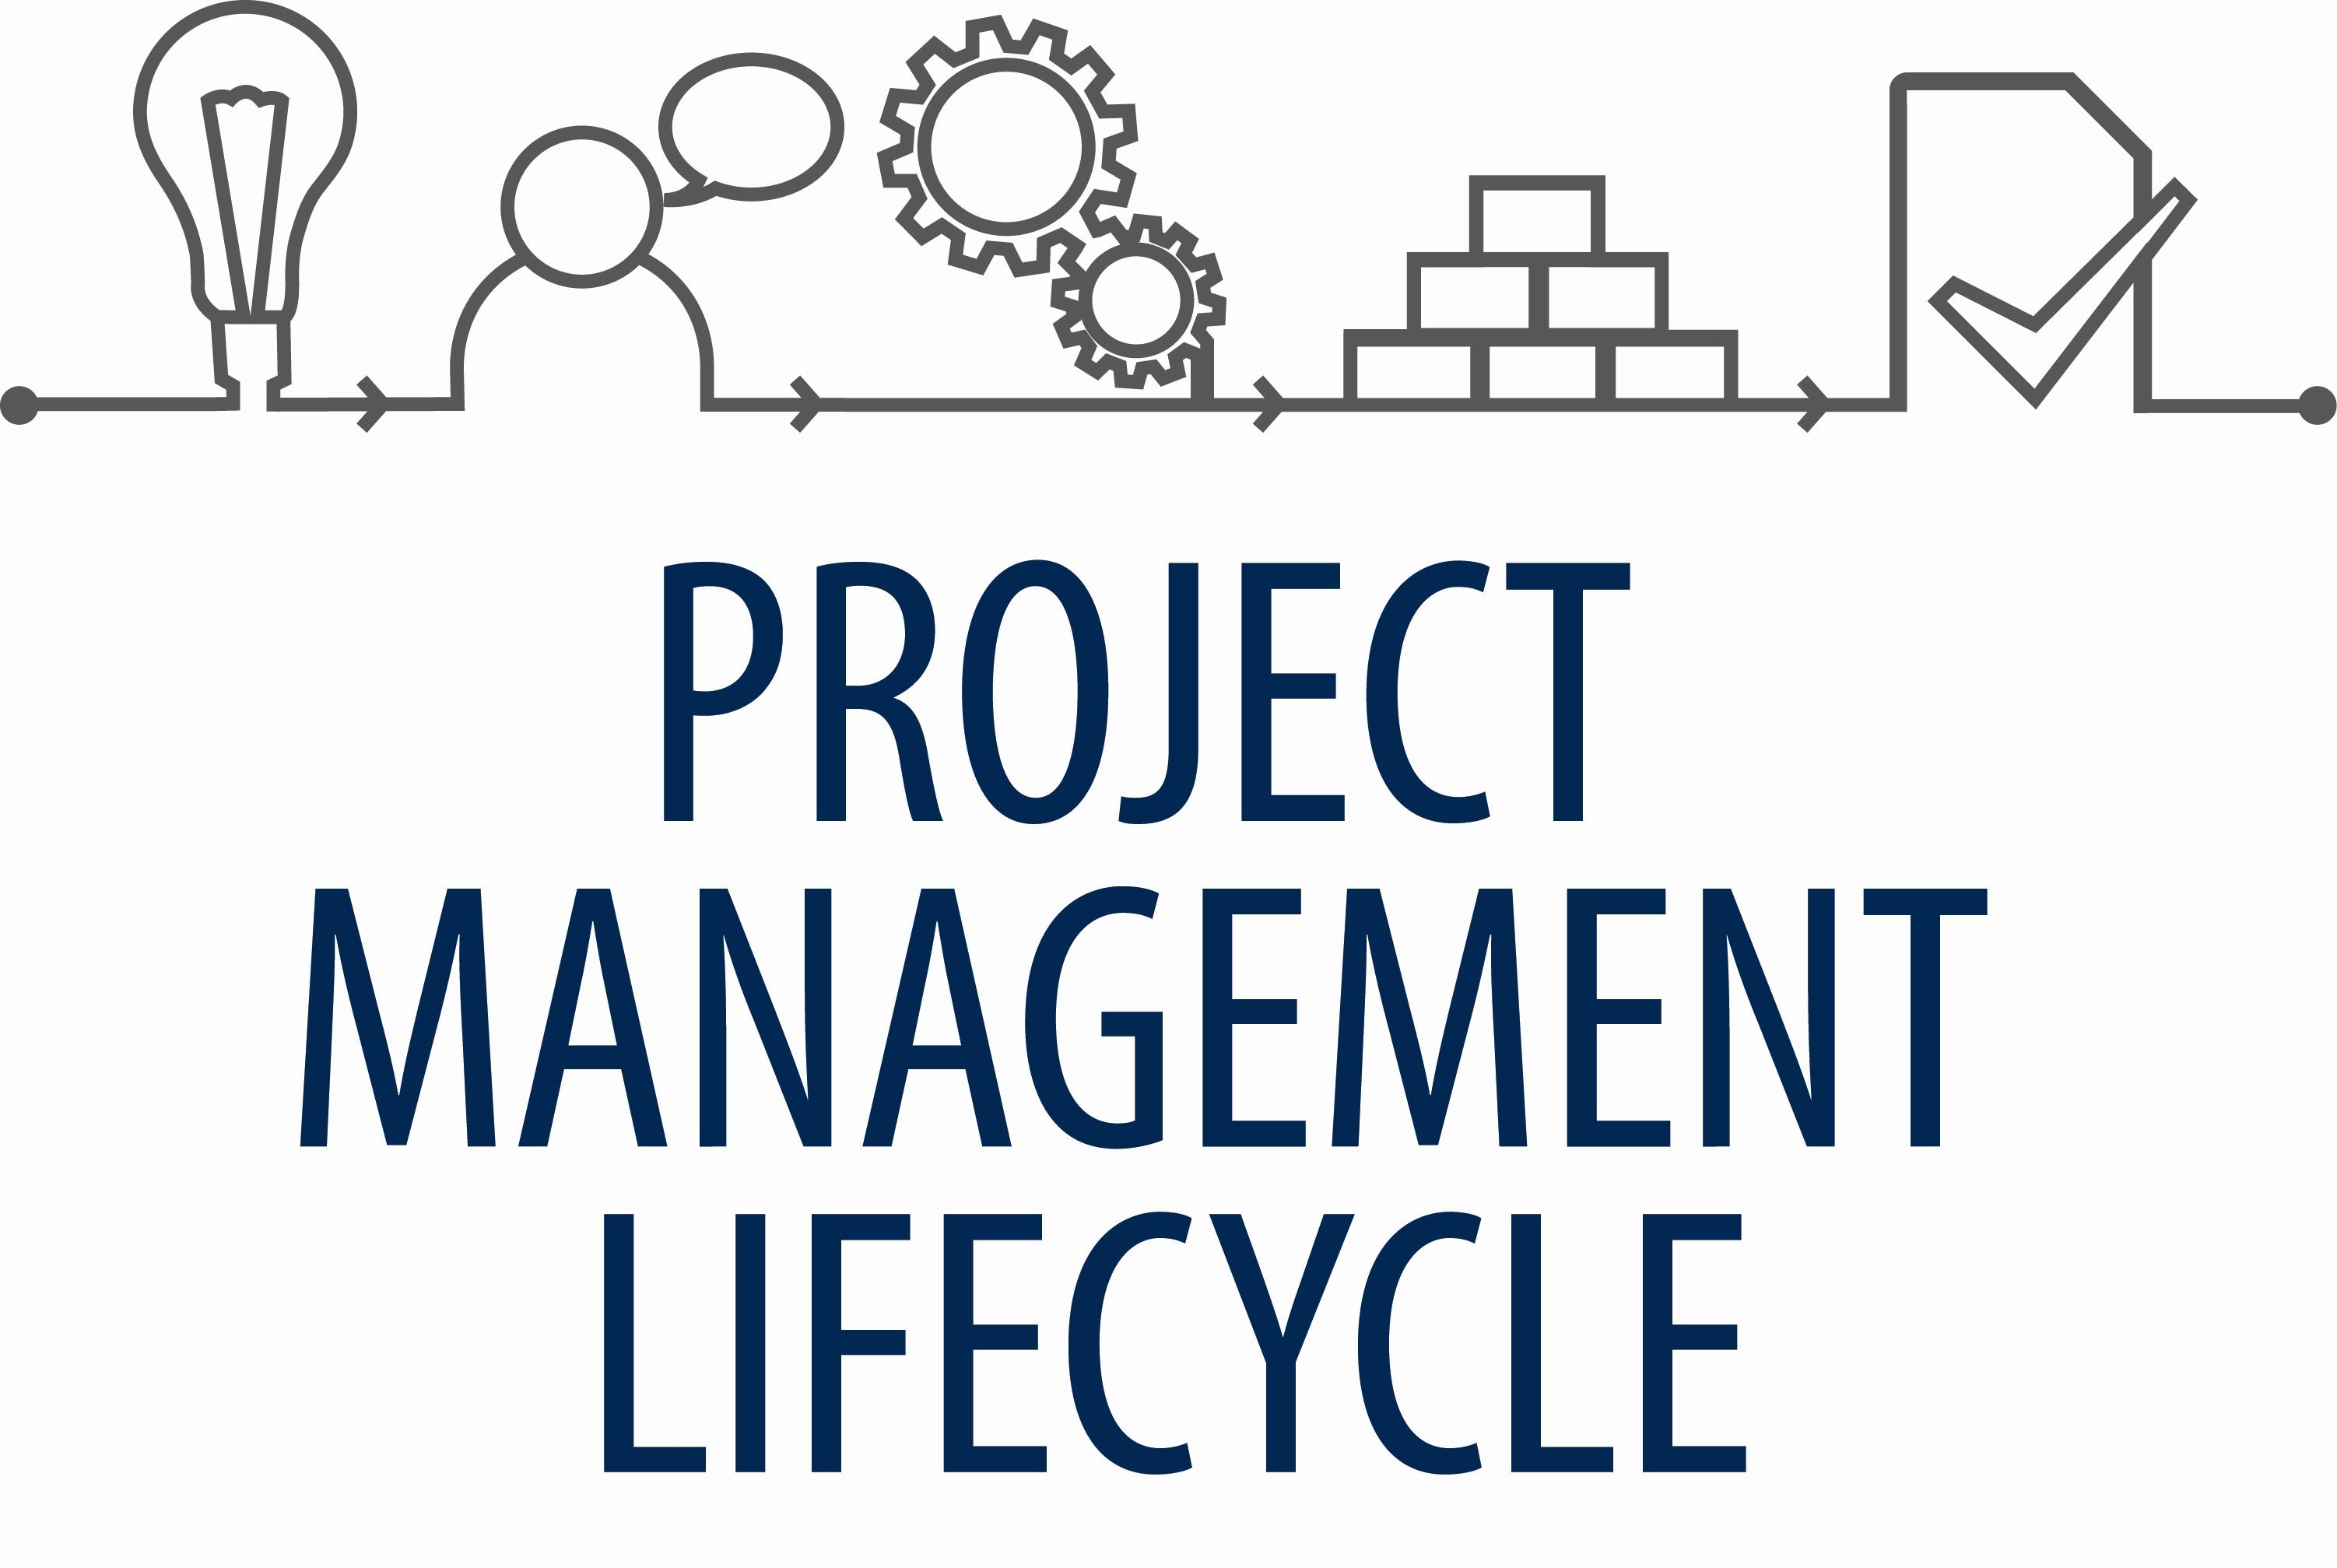 Project management system logo png